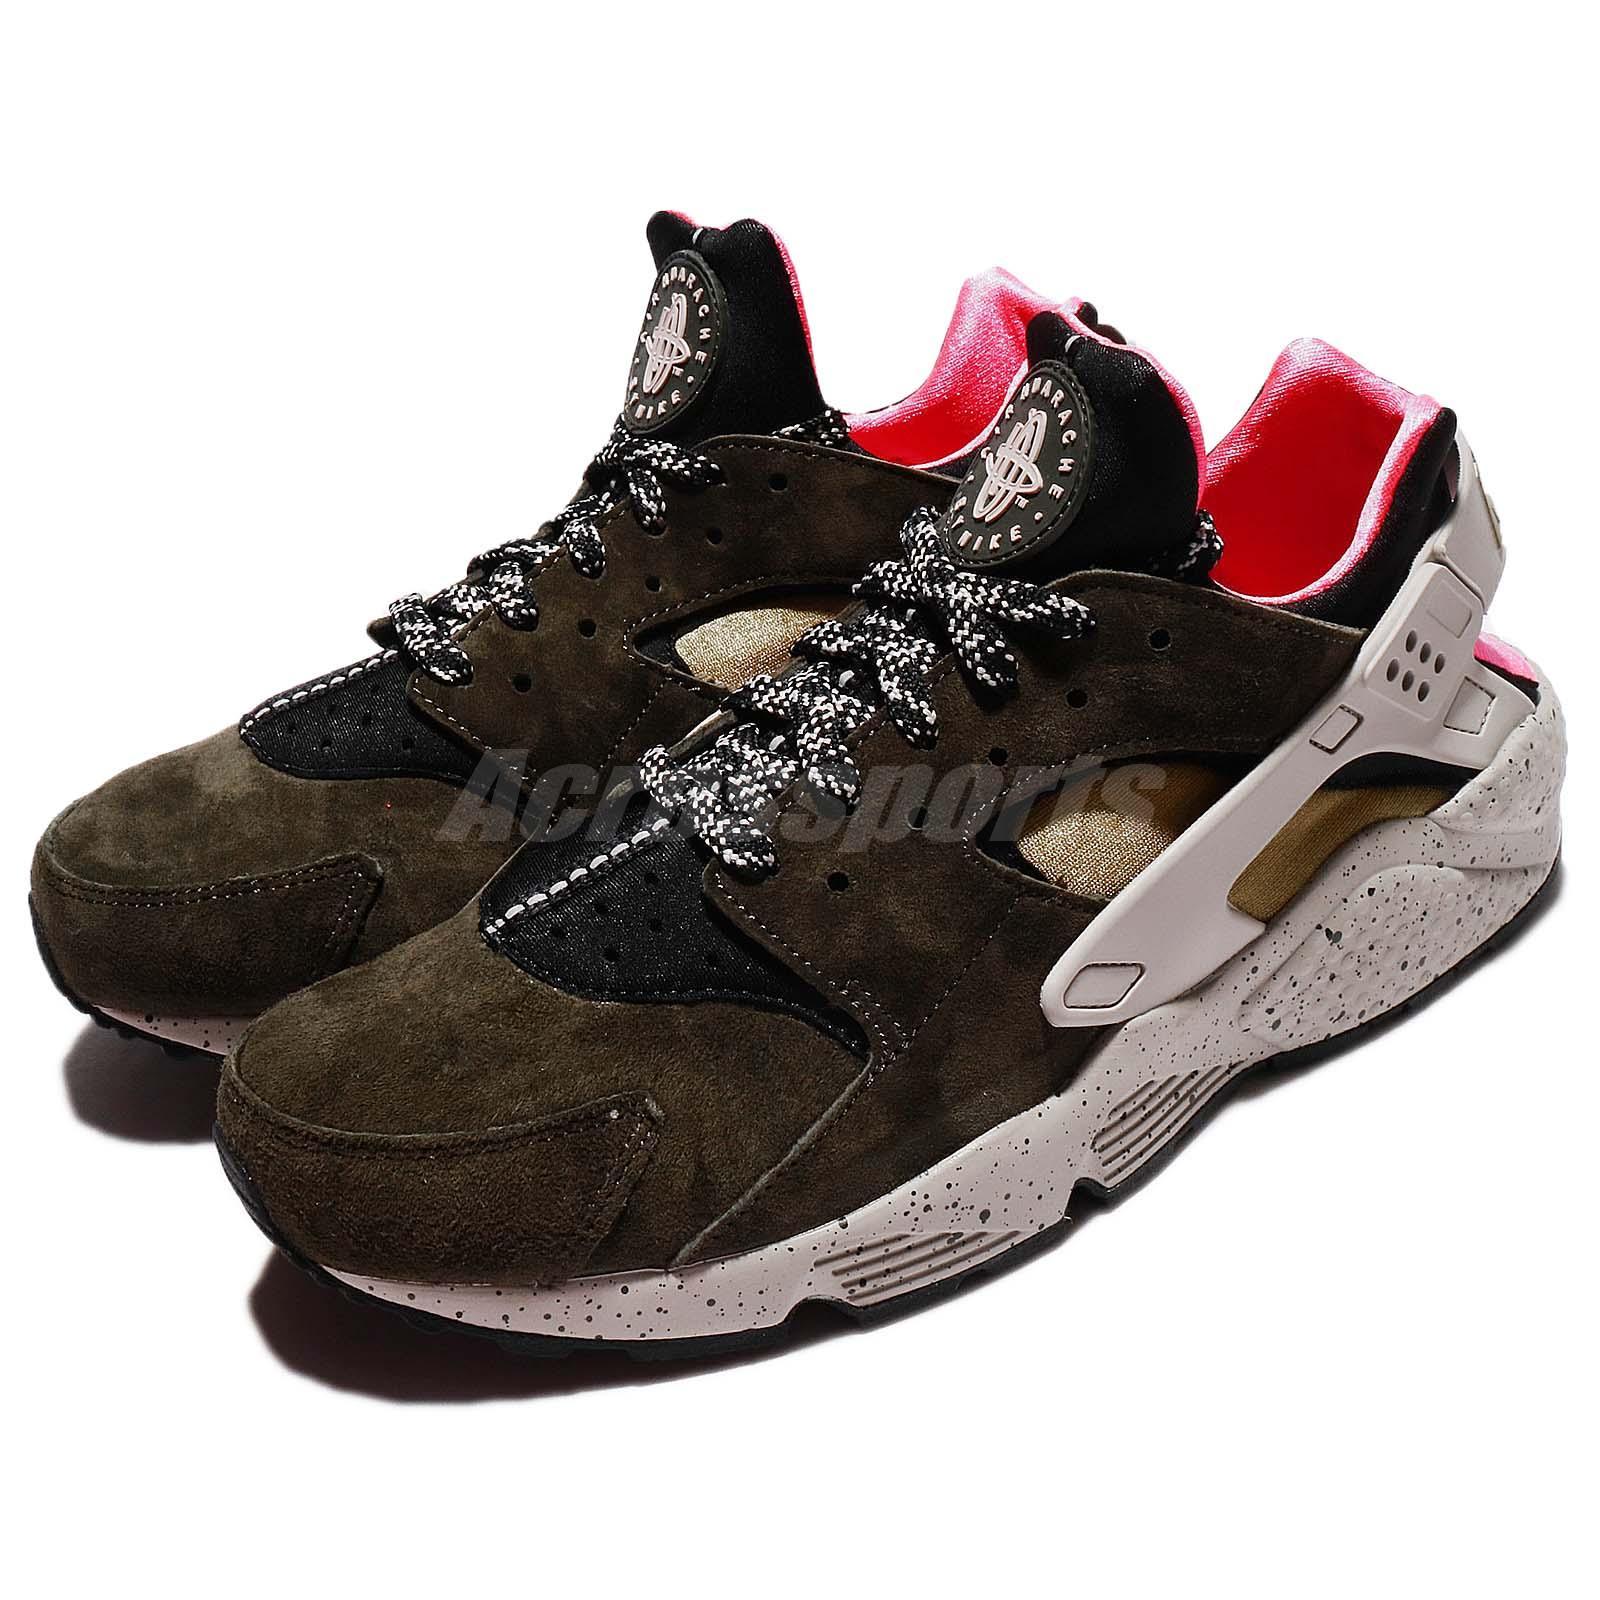 Nike Air Huarache Run PRM Green Desert Moss Solar Red Men Casual Shoe 704830010